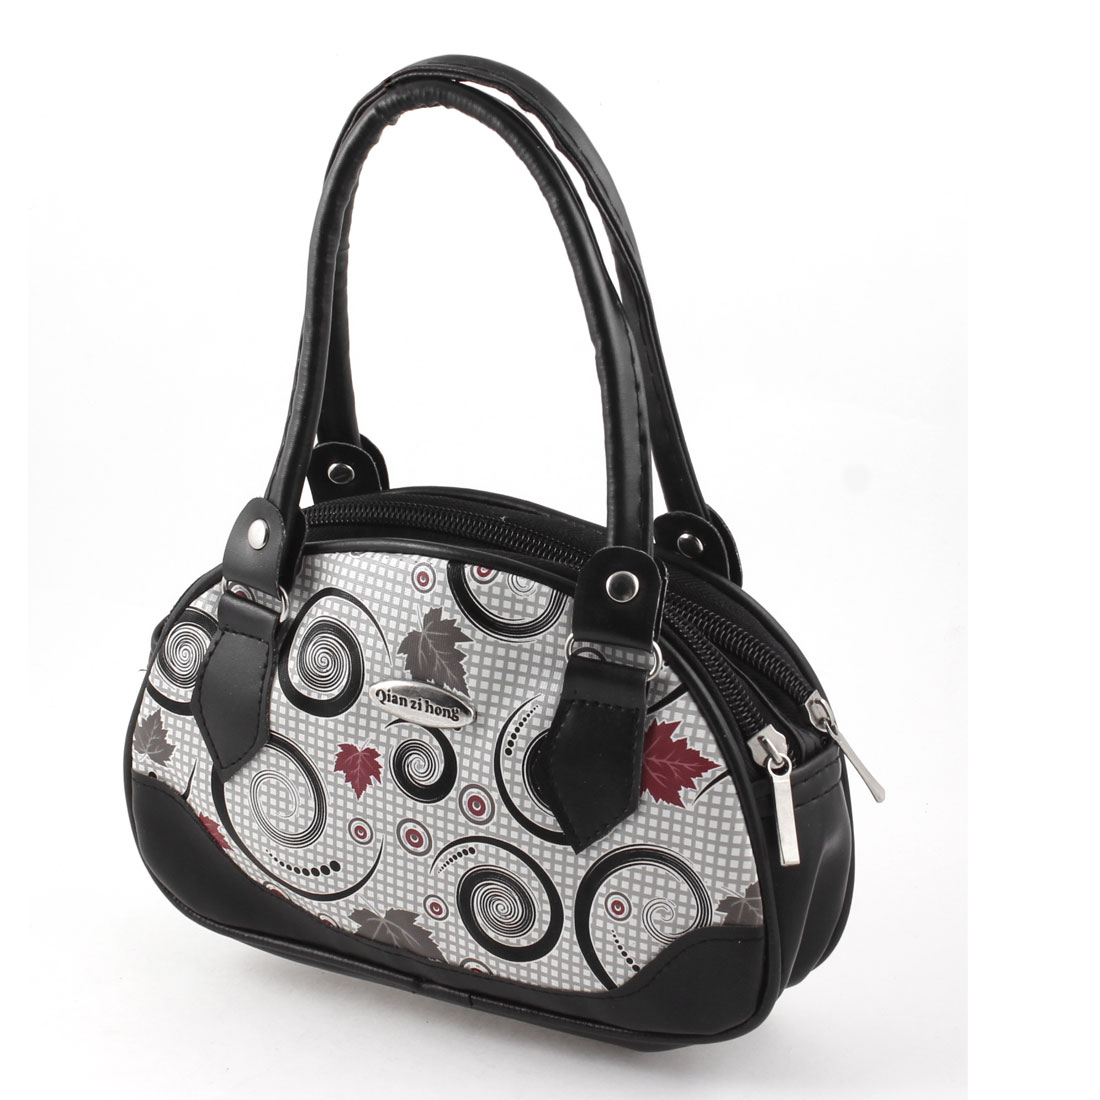 Lady Leave Pattern Black White Faux Leather Zipper Closure Change Purse Handbag